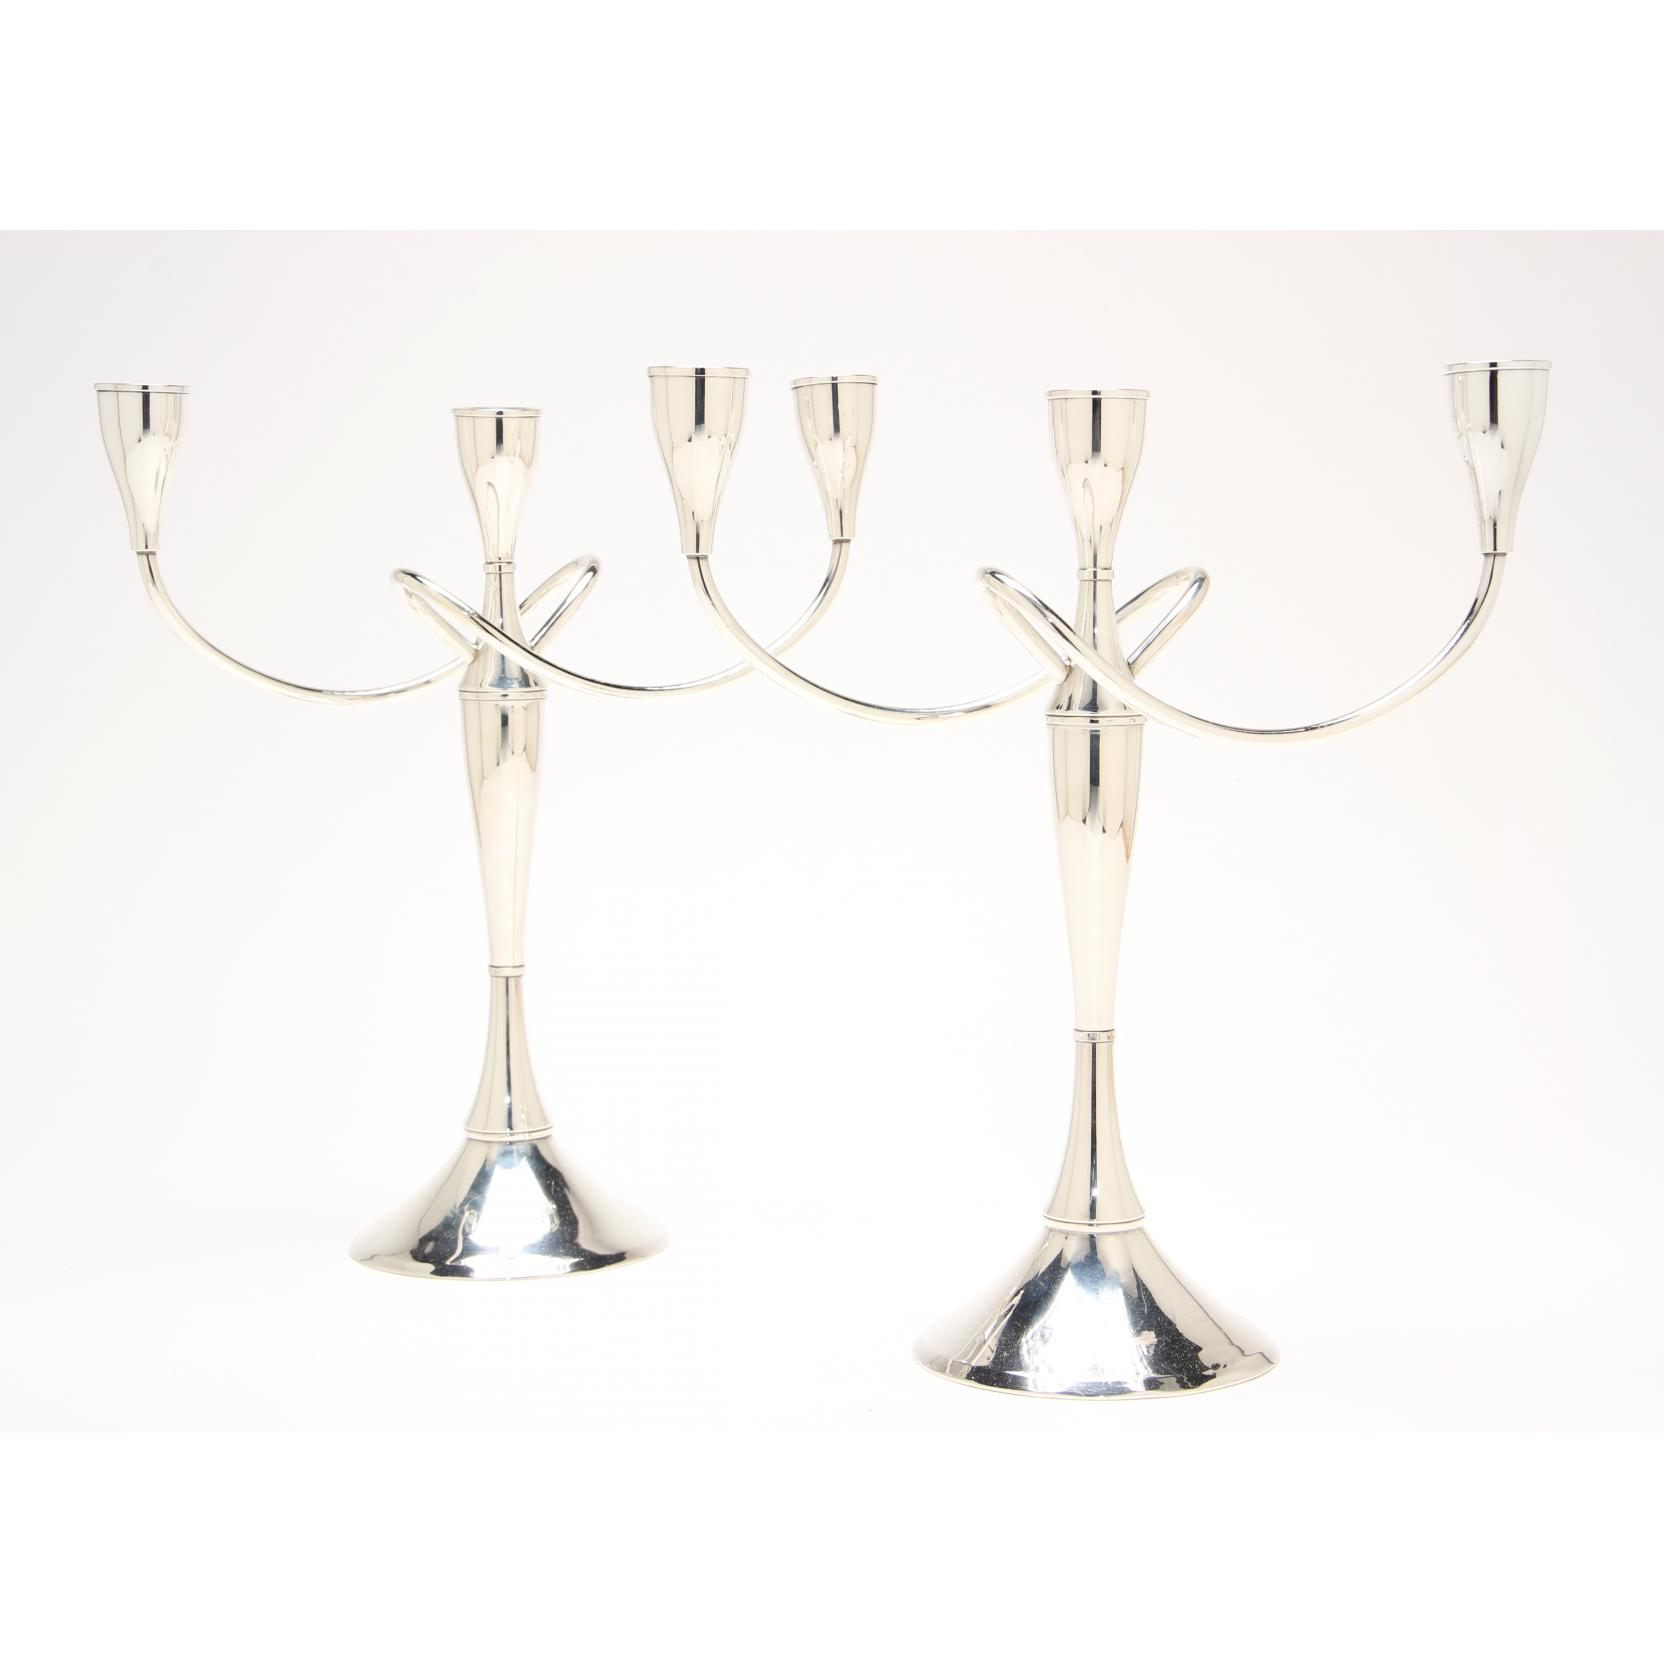 pair-of-international-sterling-silver-candelabra